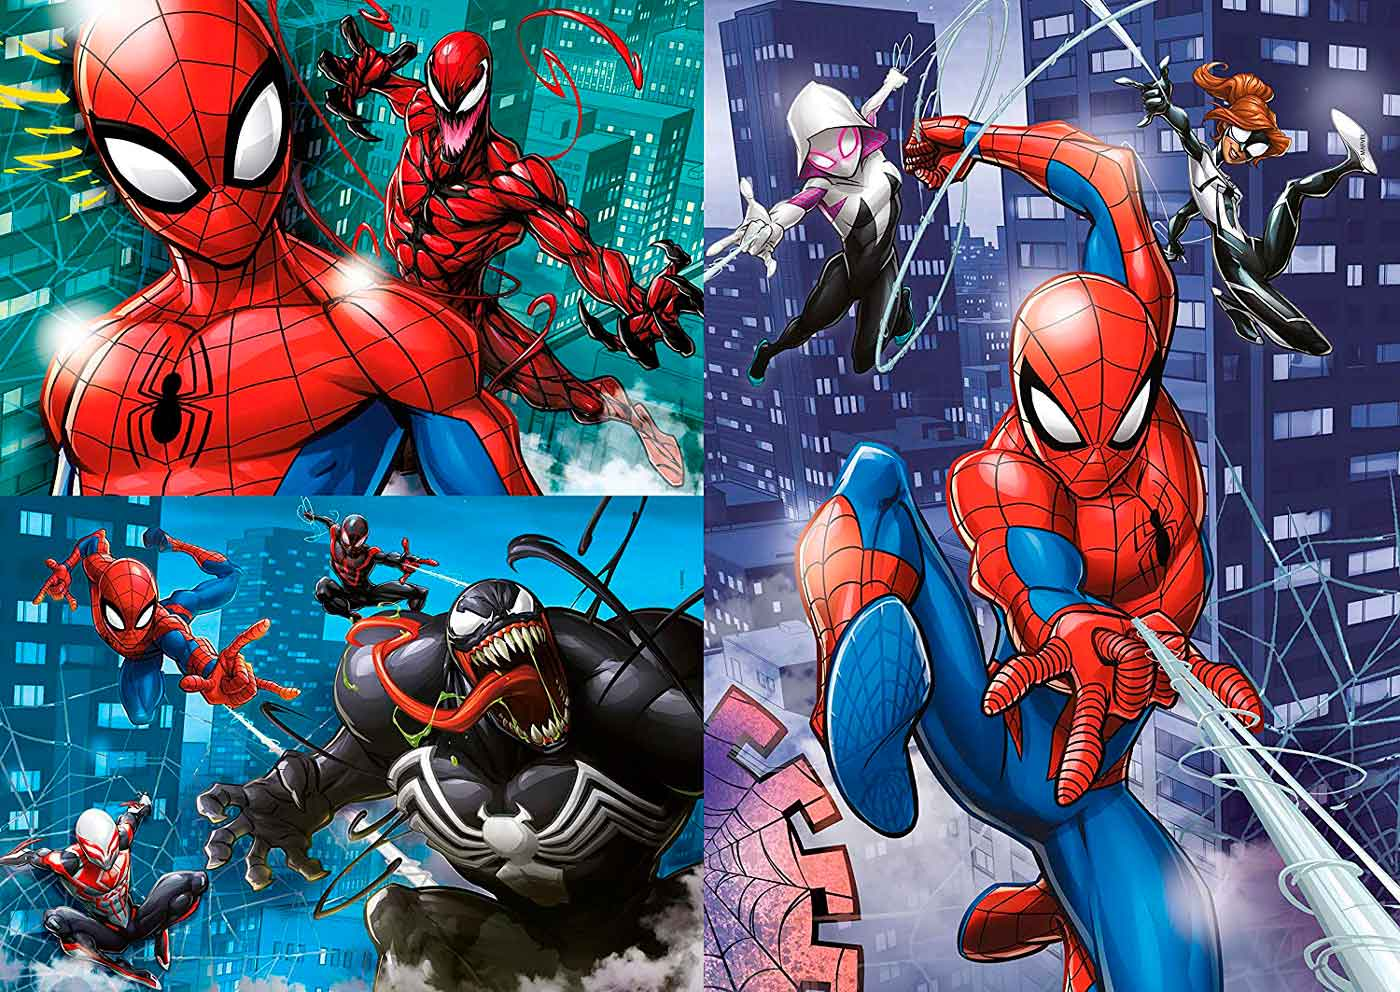 Puzzle Clementoni Spiderman 3 x 48 Piezas